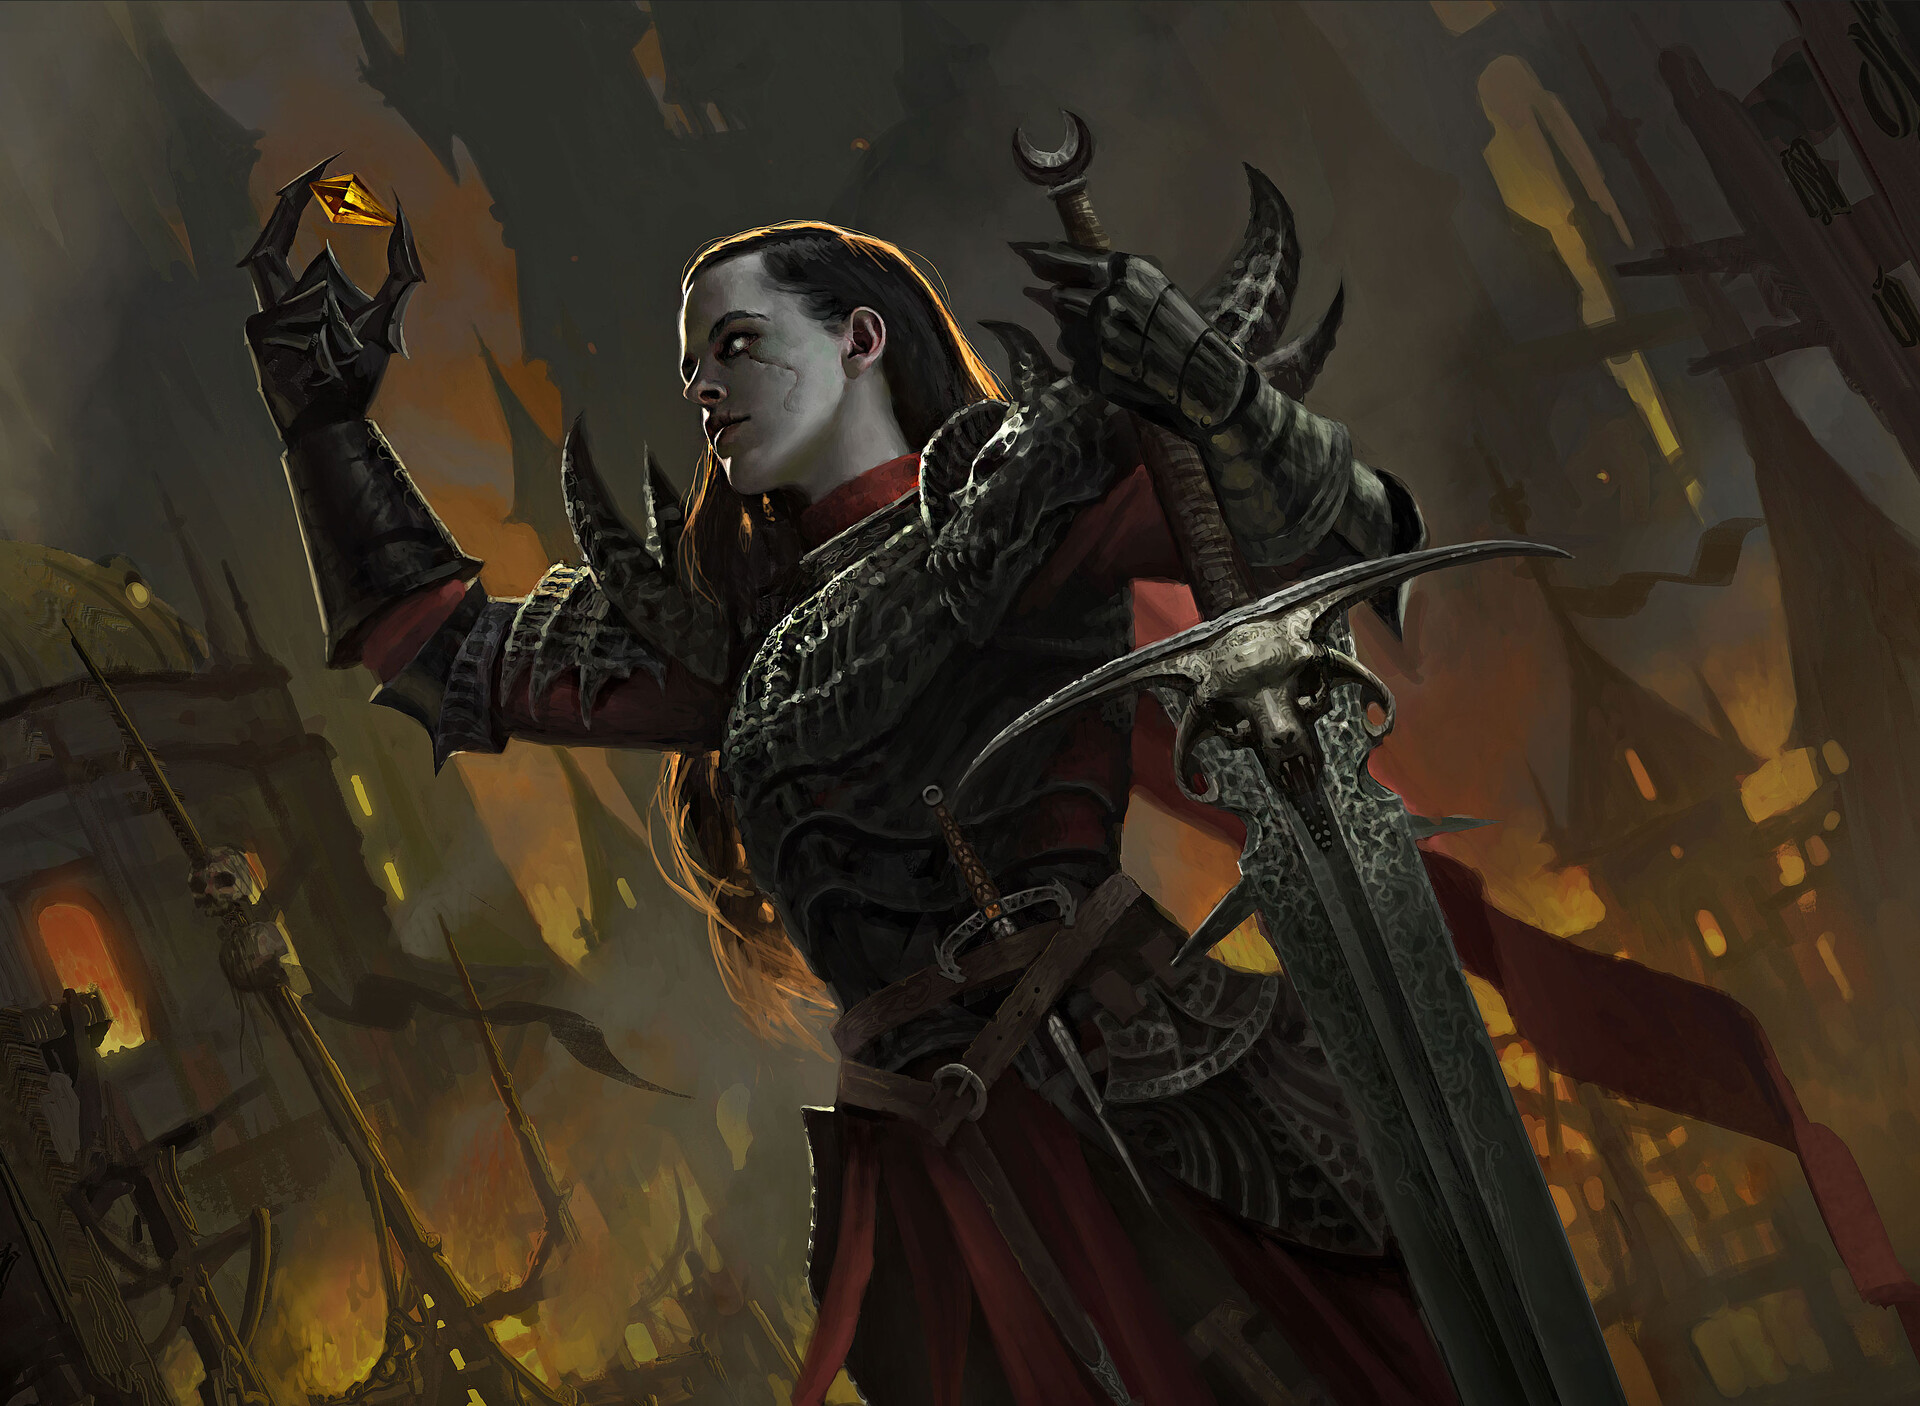 Lorenzo Mastroianni Artwork Fantasy Art Fantasy Girl Girls With Swords Fantasy Armor Sword Weapon 1920x1406